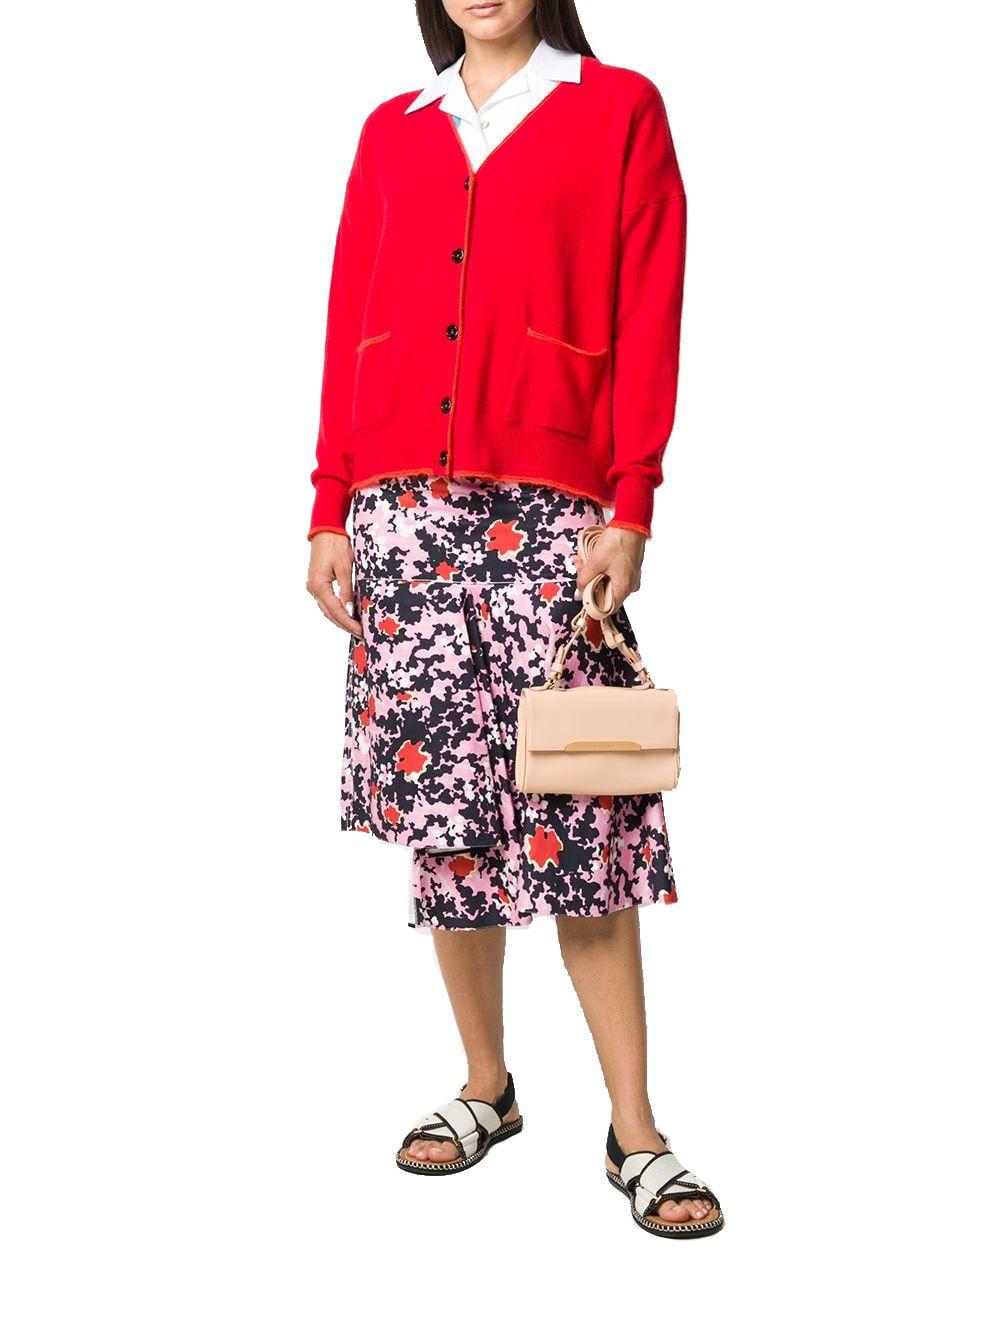 MARNI Leathers MARNI WOMEN'S BEIGE LEATHER SHOULDER BAG